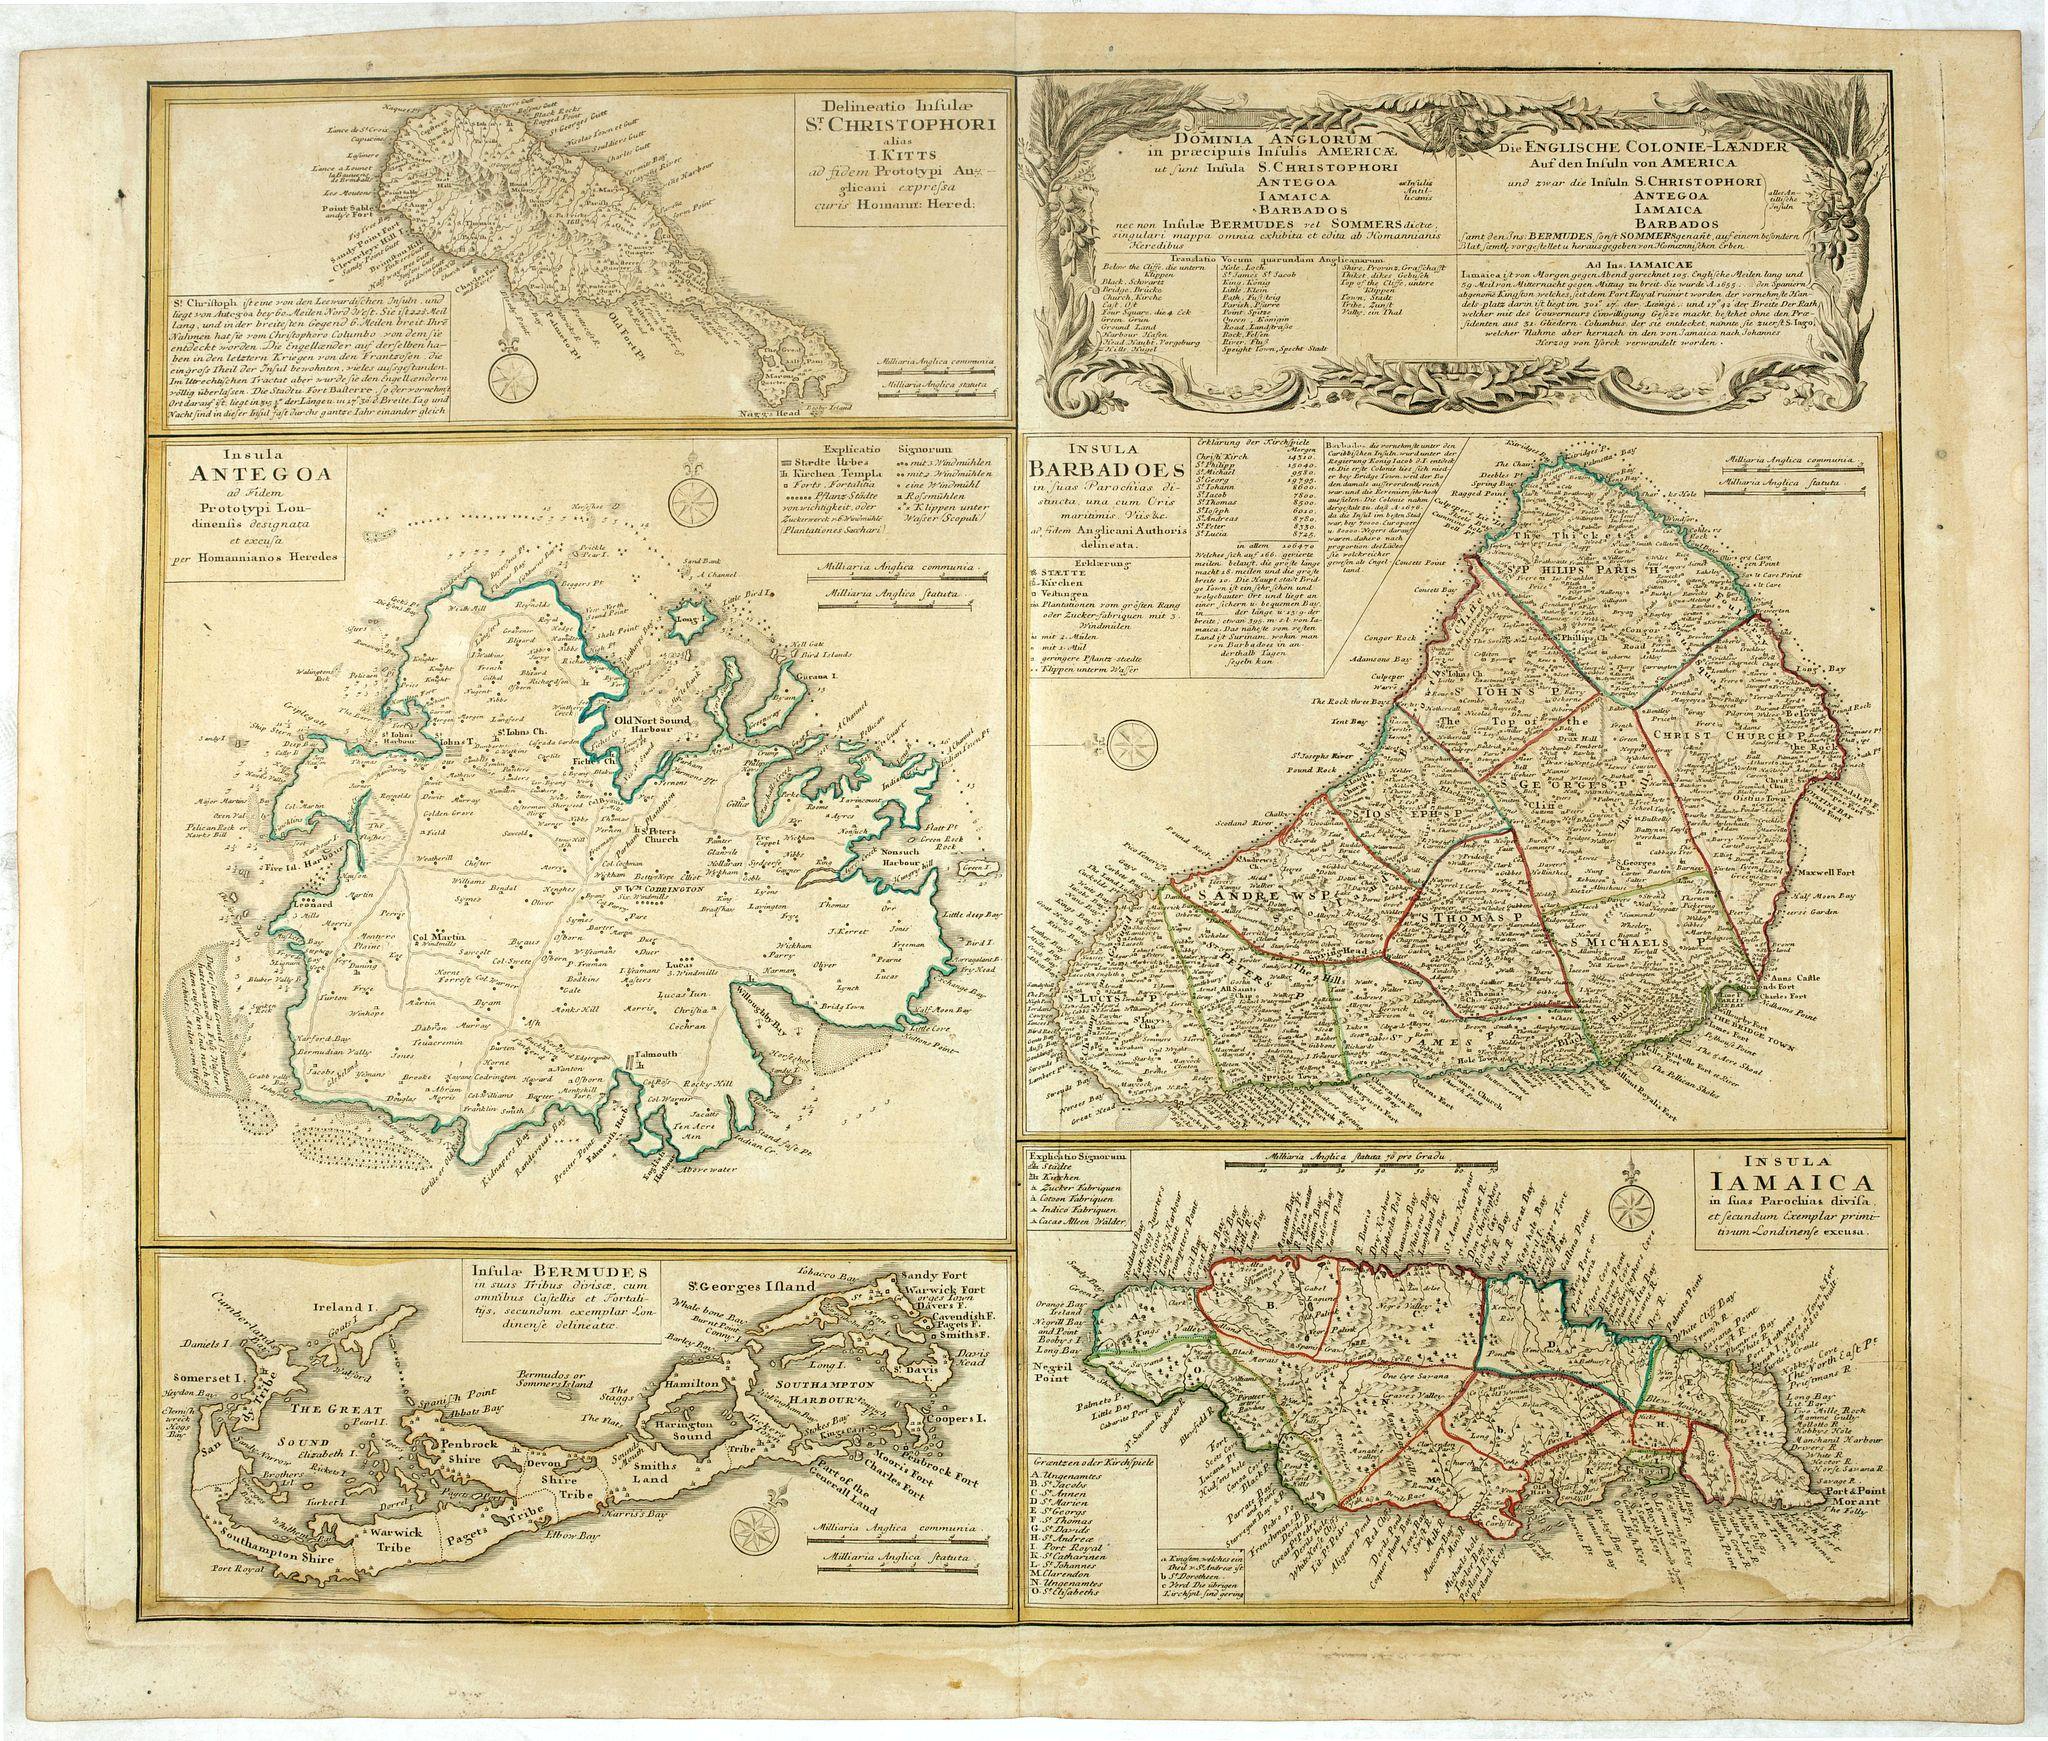 HOMANN HEIRS. -  [Five maps on one sheet] Dominia Anglorum in praecipuis Insulis Americae ut sunt Insula S. Christopheri, Antegoa, Iamaica, Barbados nec non Insula Bermudes vel Sommers . . .